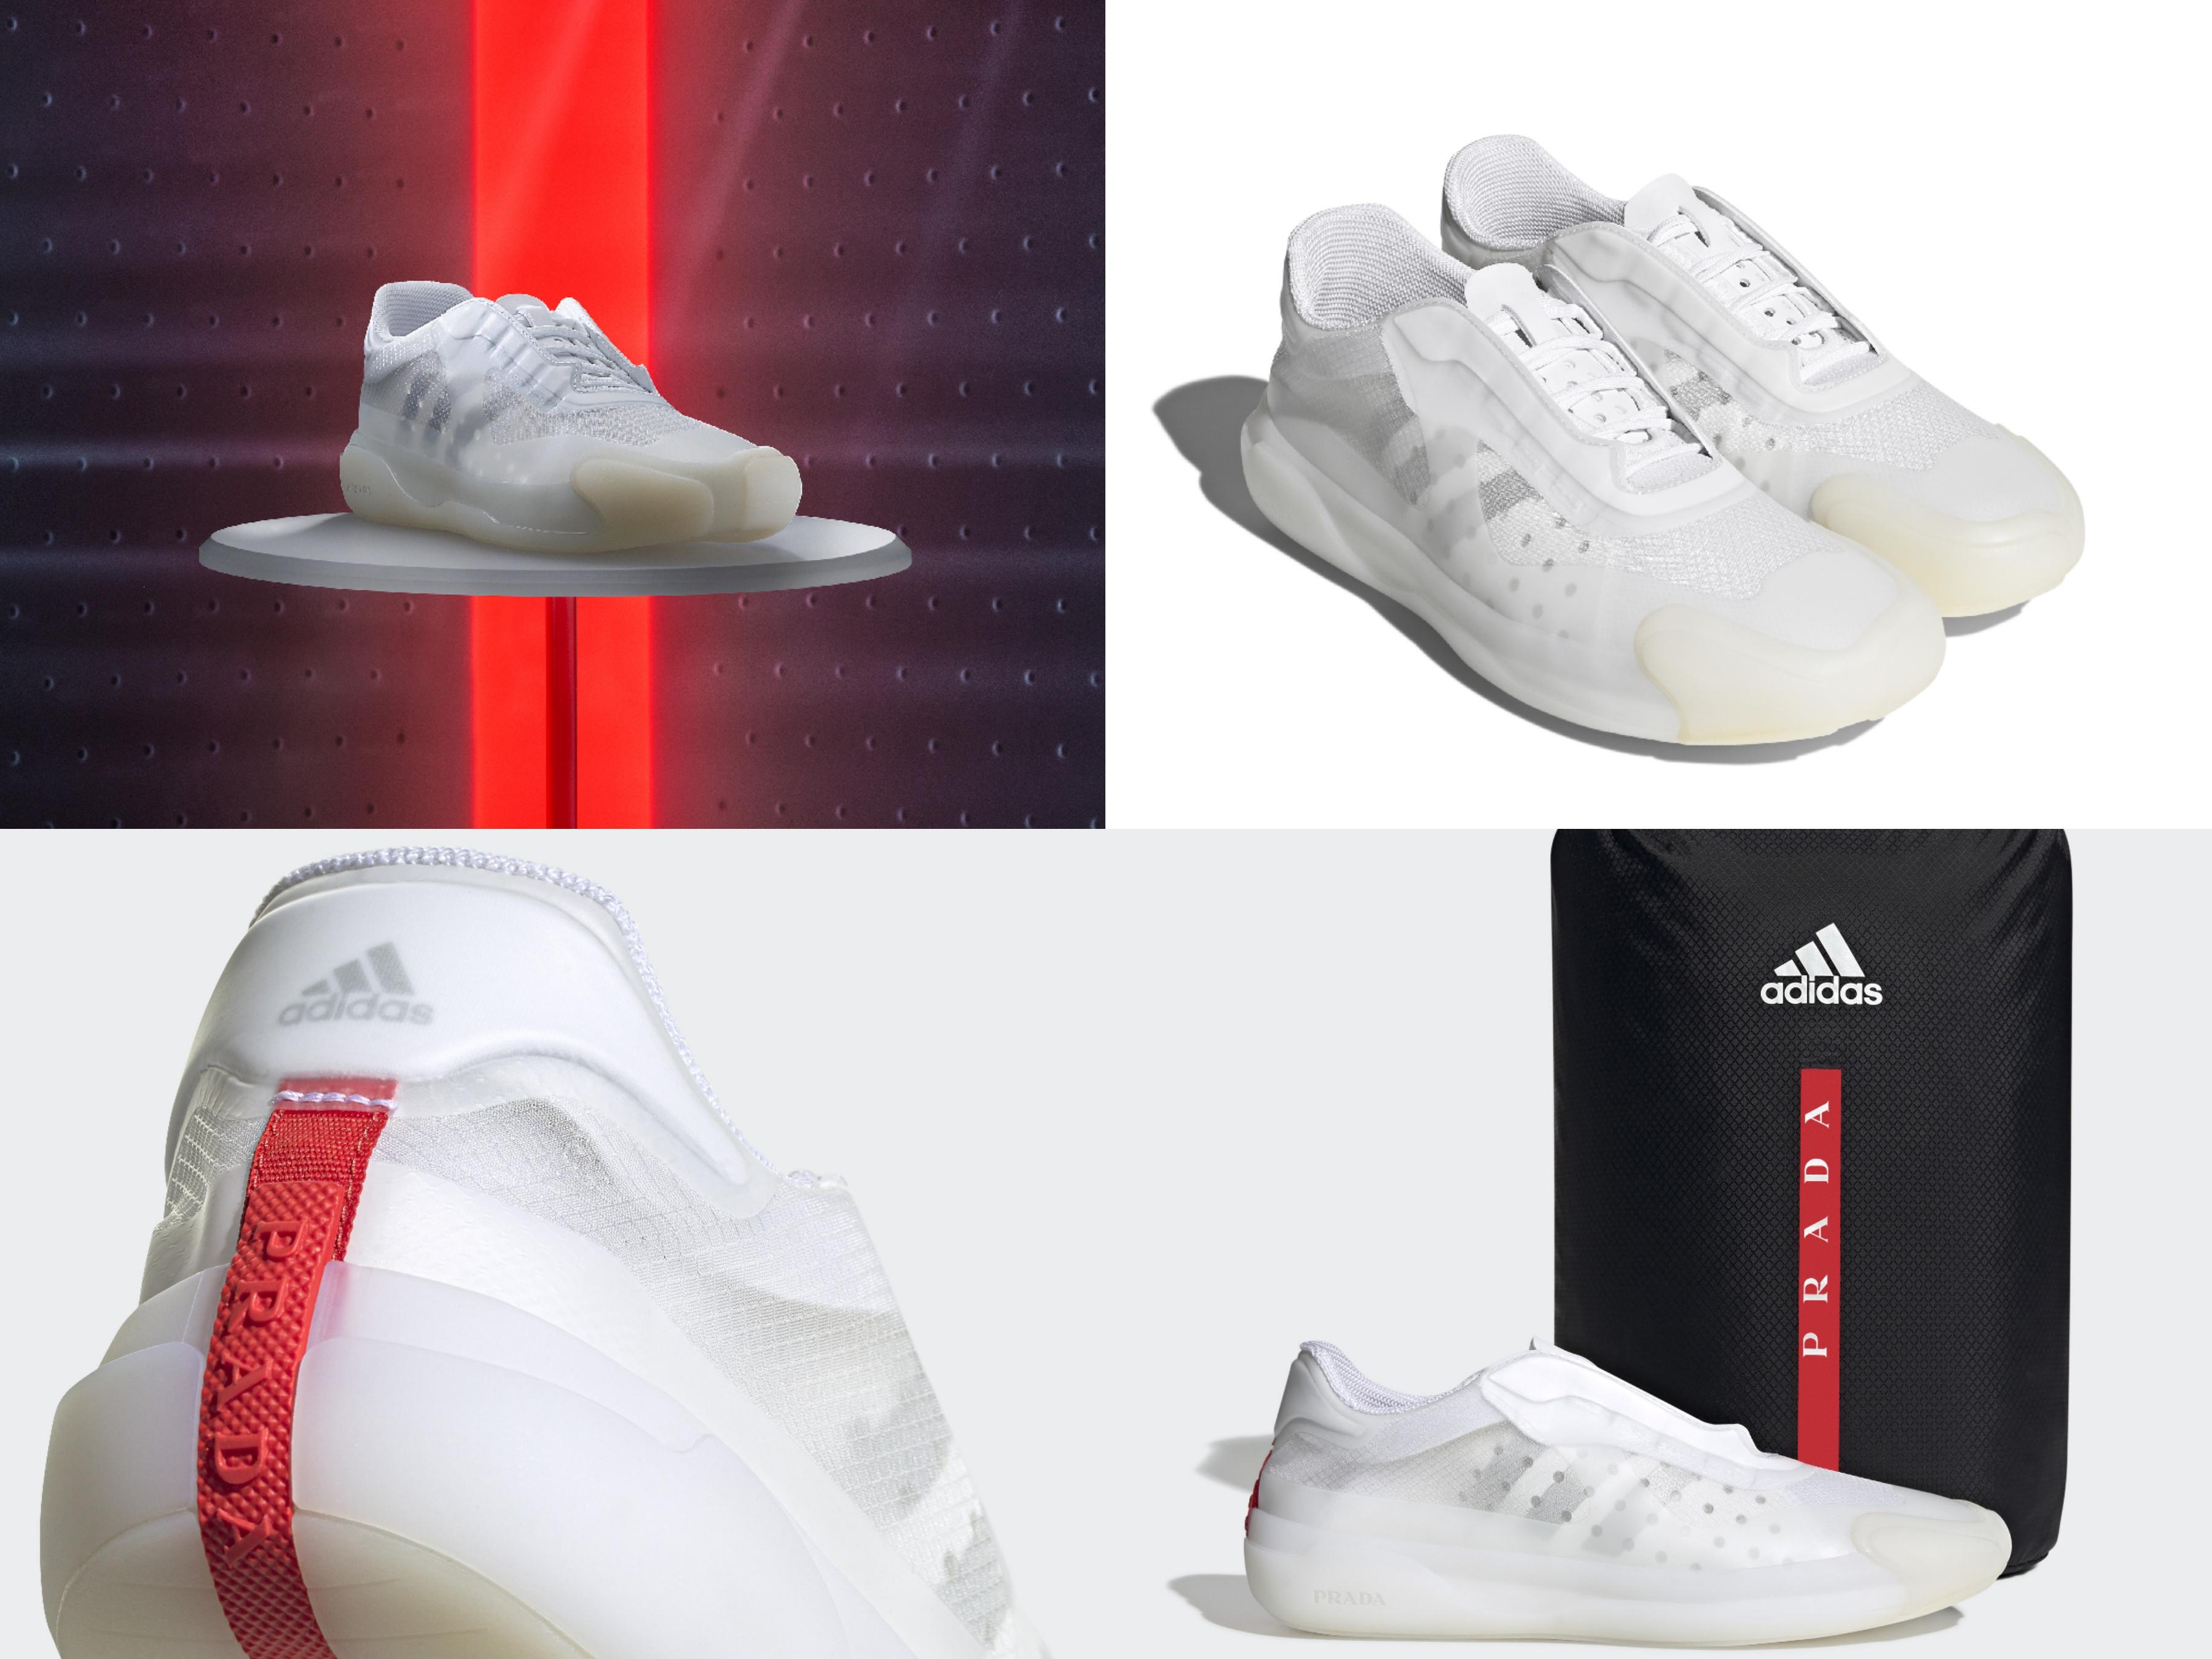 adidas for Prada A+P LUNA ROSSA 21鞋款 NT$19000 具備流線型俐落線條與輕量質感,獨具時尚美學風格